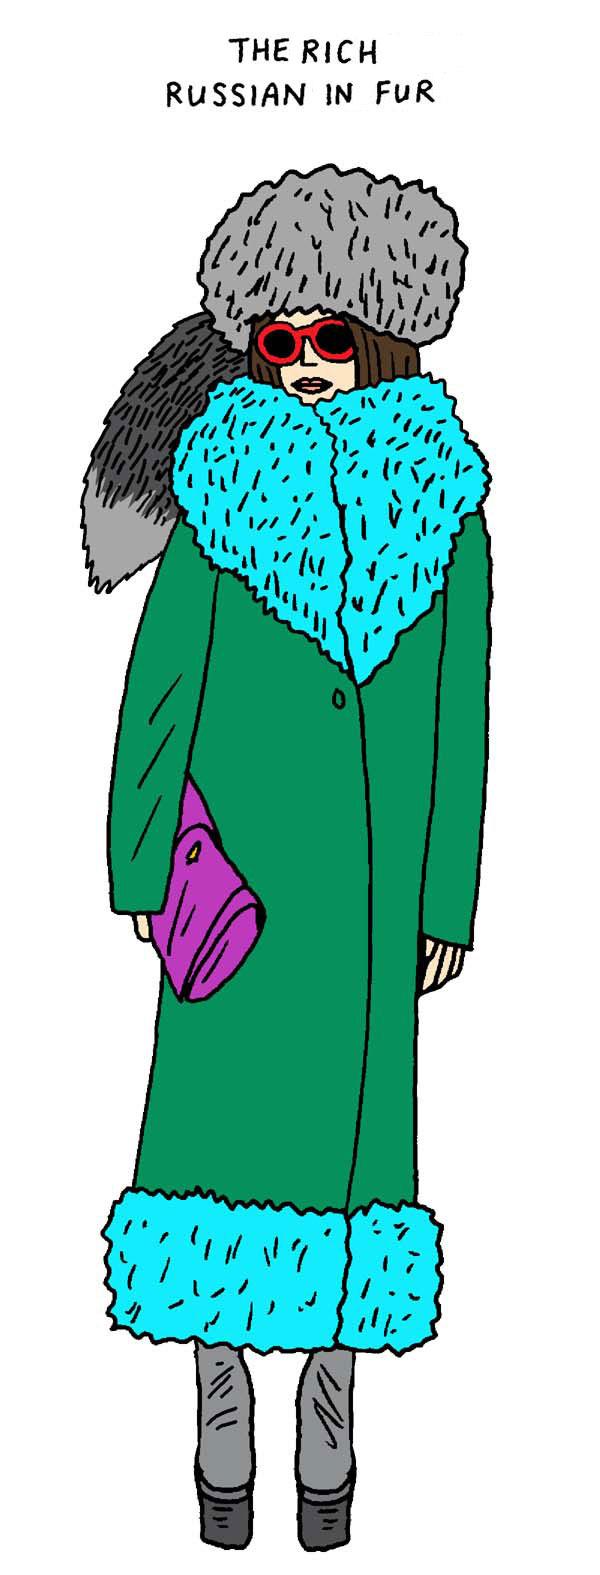 10-rich-russian-in-fur.nocrop.w710.h2147483647.jpg